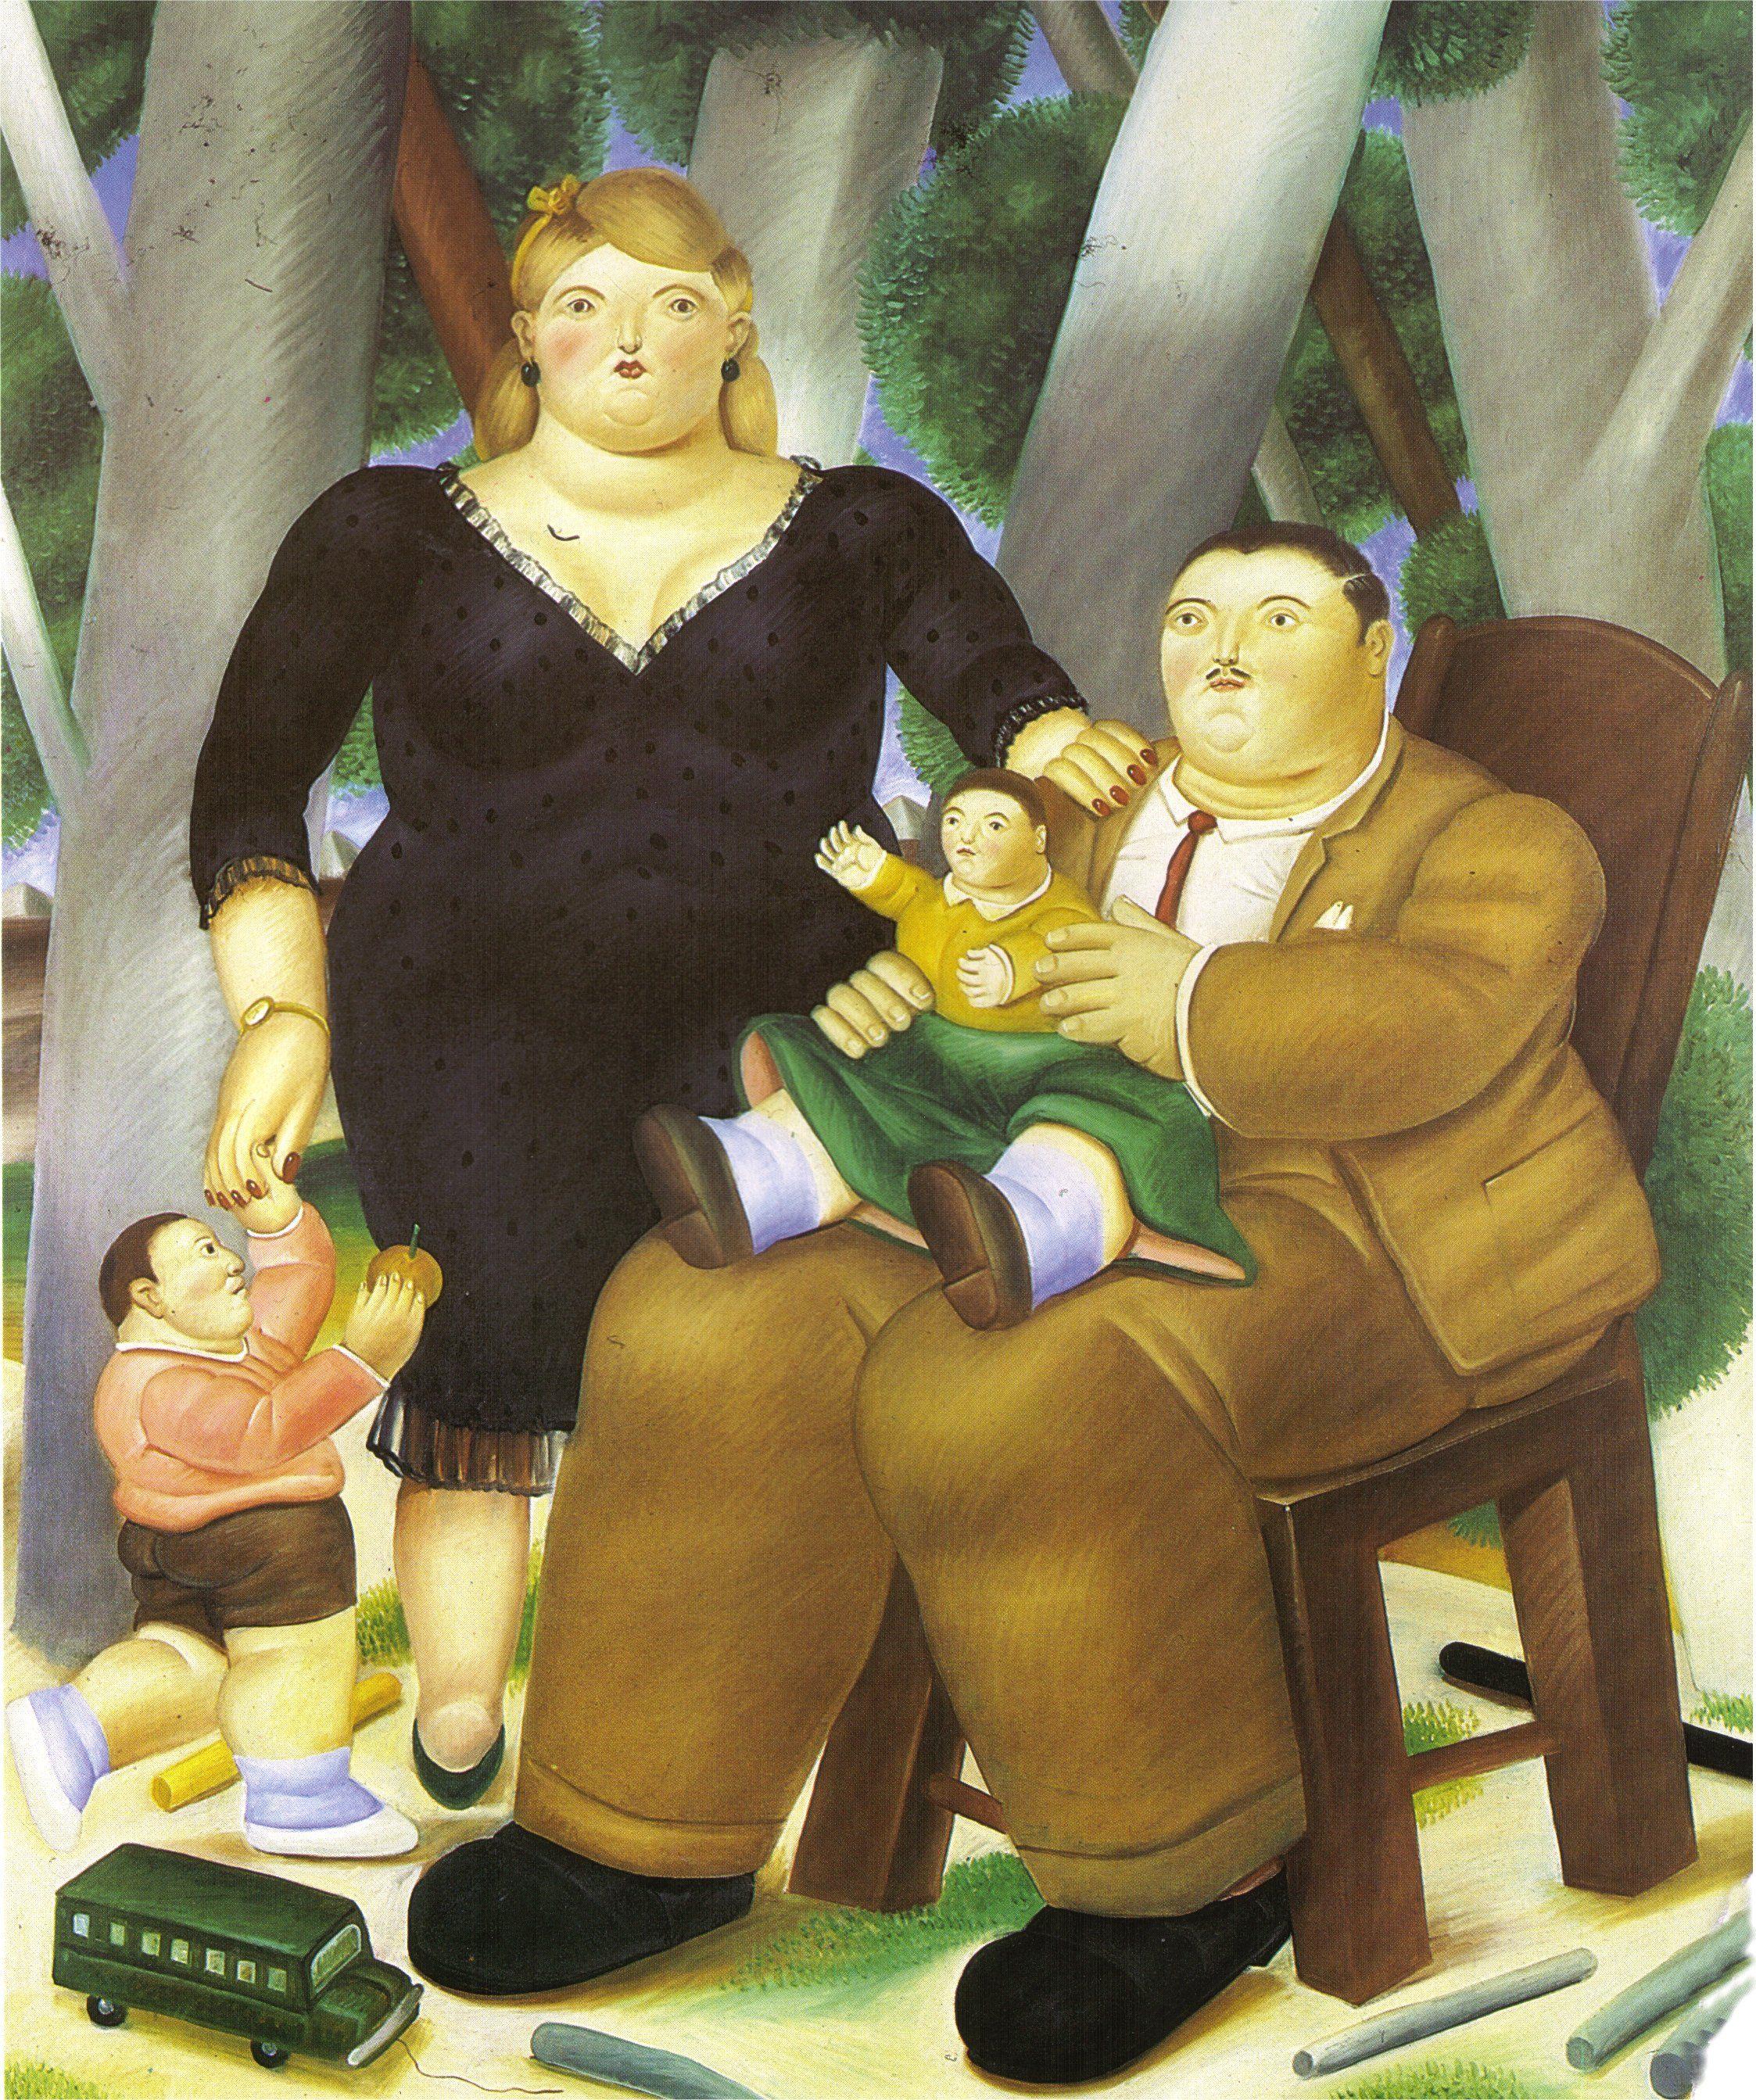 fernando botero | Family | Fernando botero, Art, Naïve artist